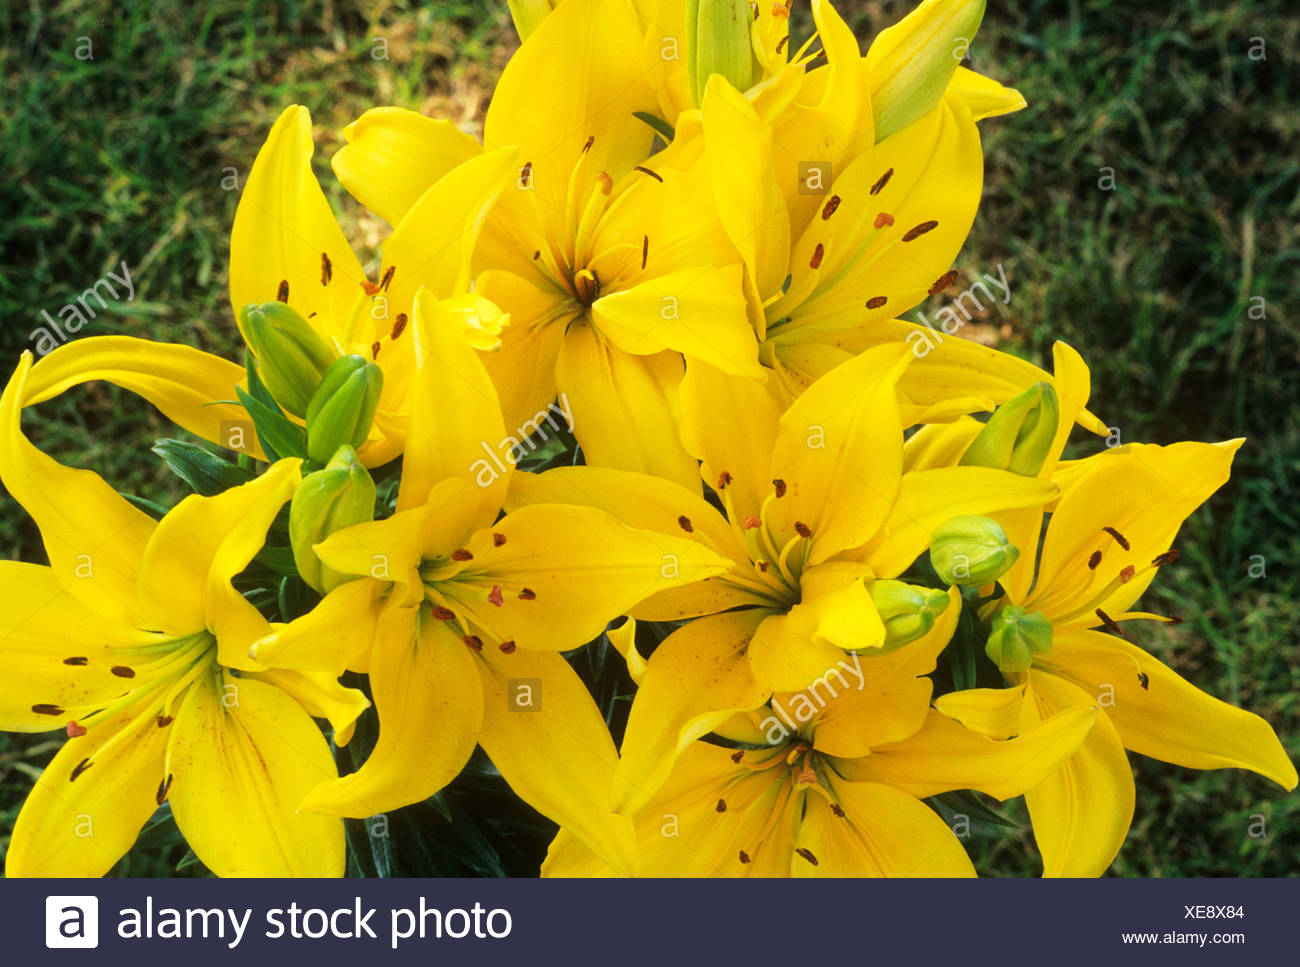 Lilium Lemon Pixie Dwarf Oriental Lily Yellow Flower Garden Plant